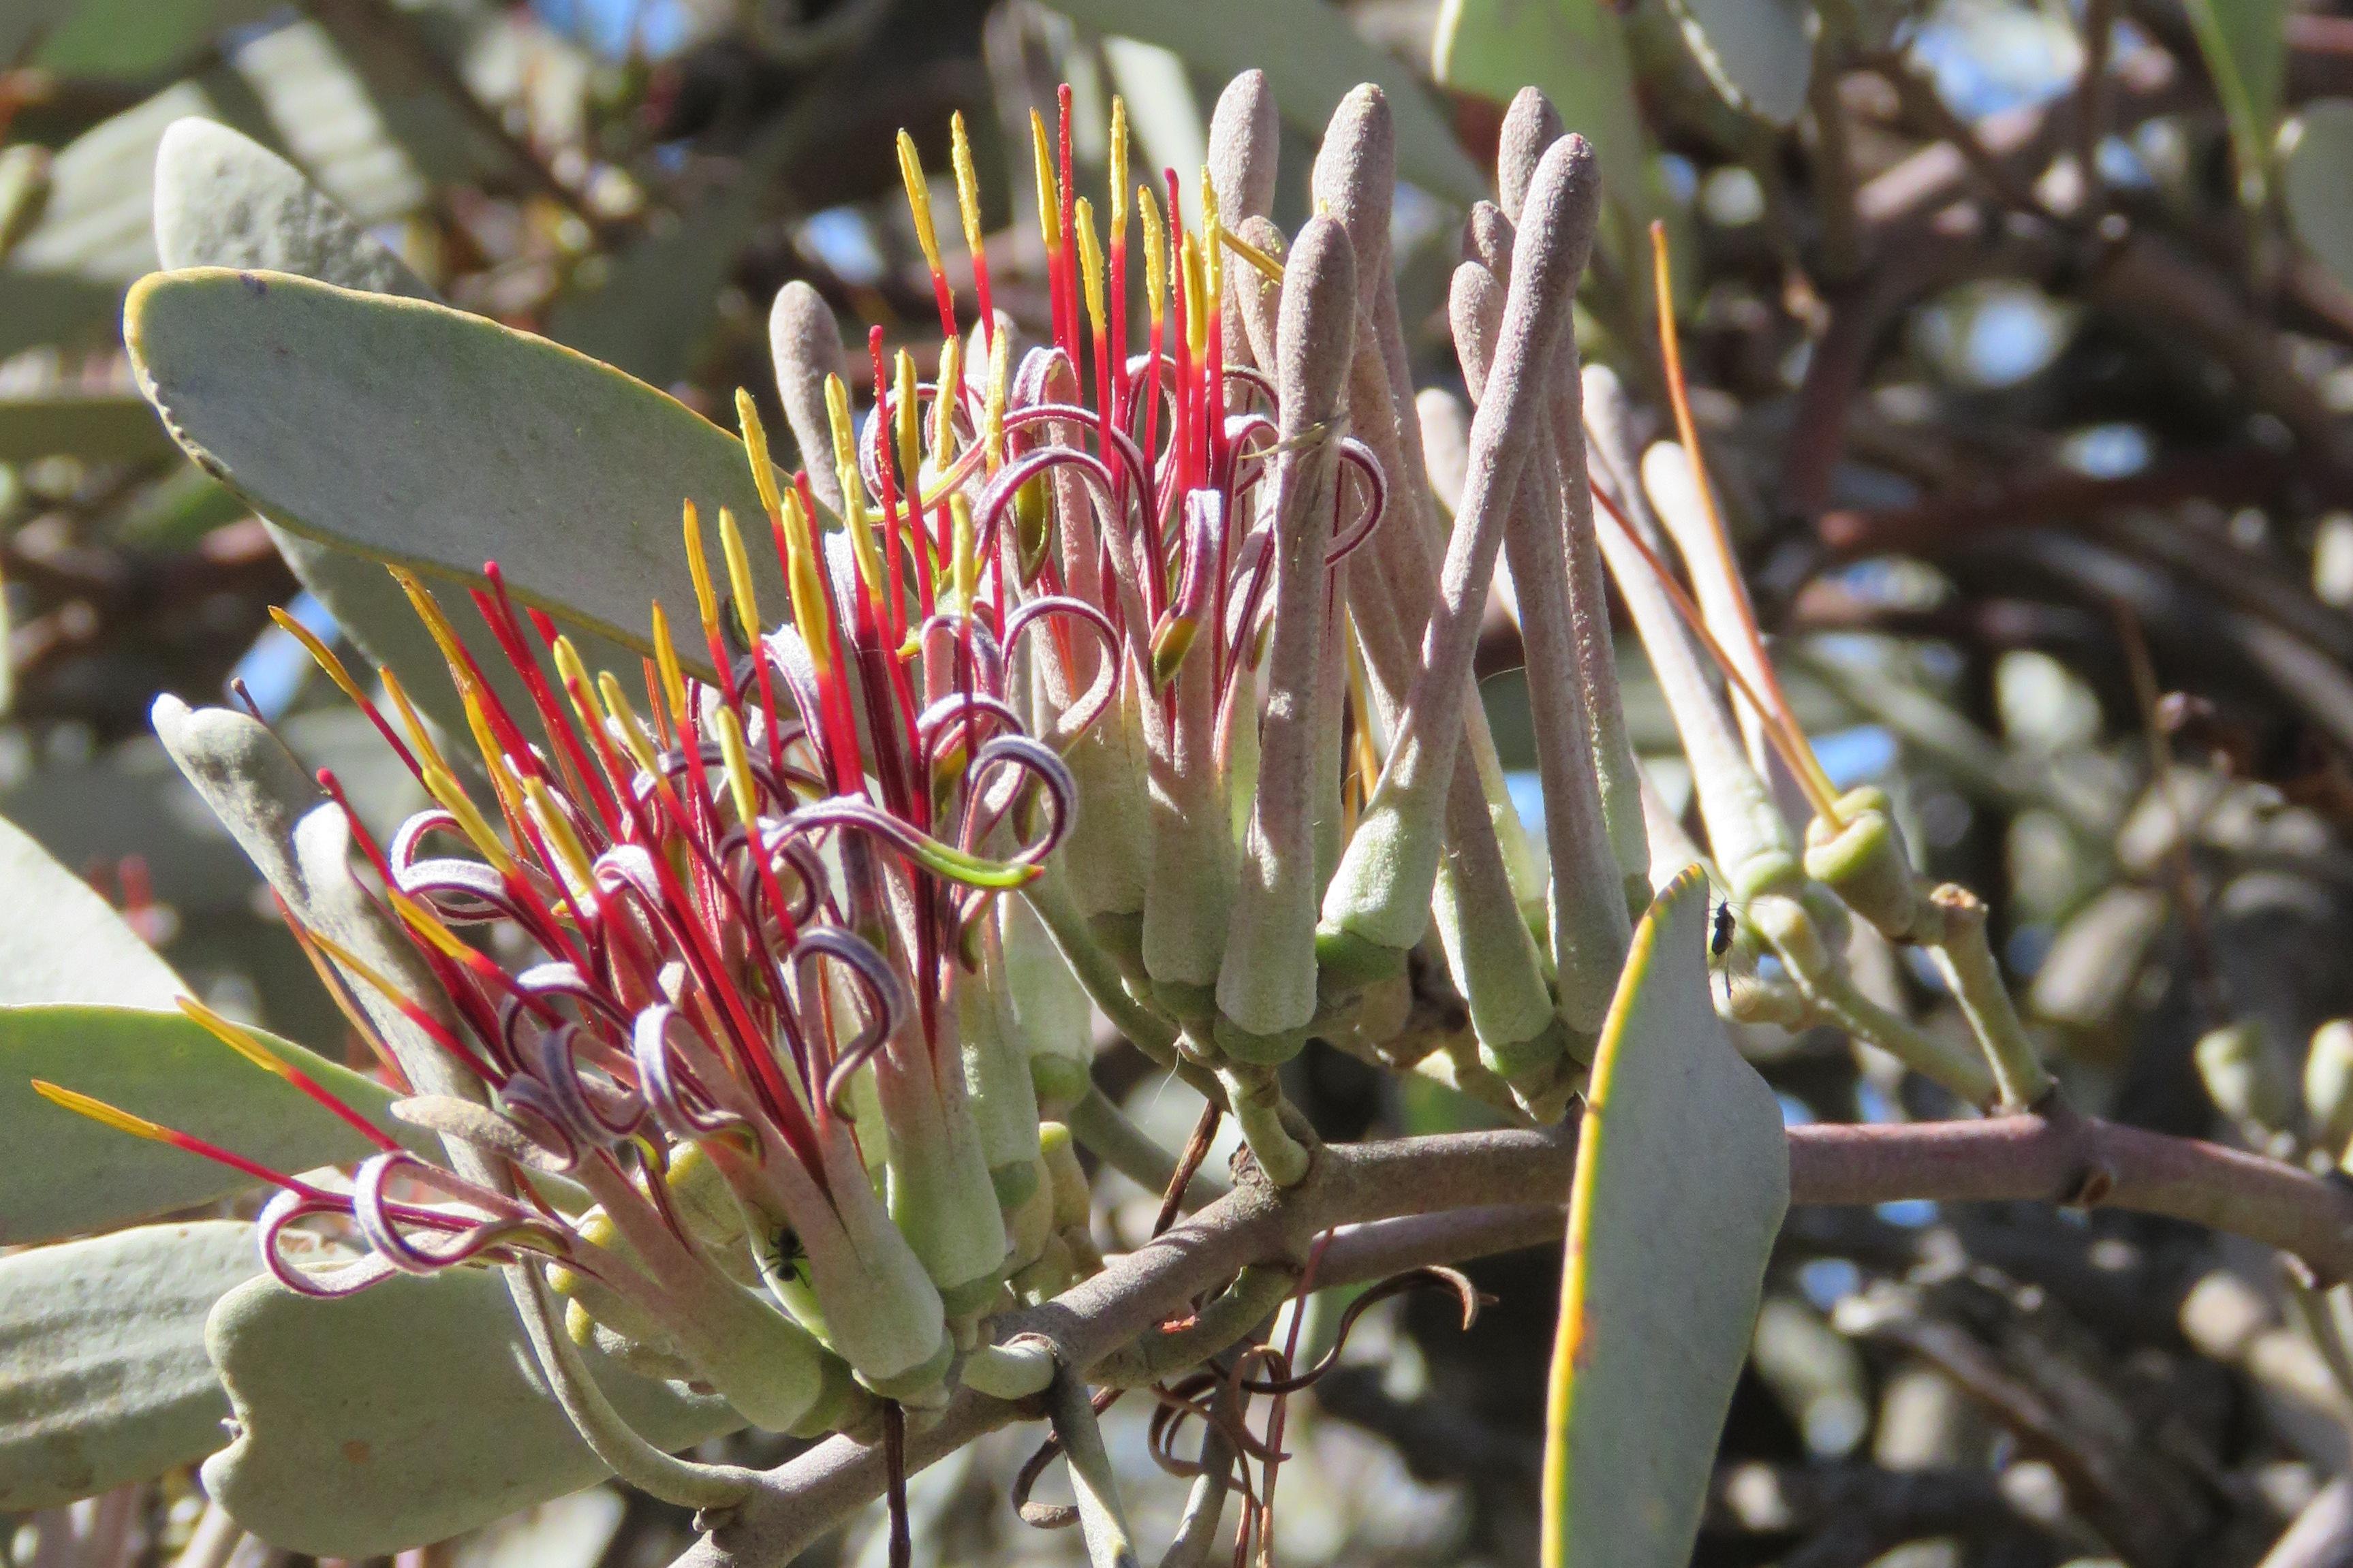 Australian Mistletoes In The Environment